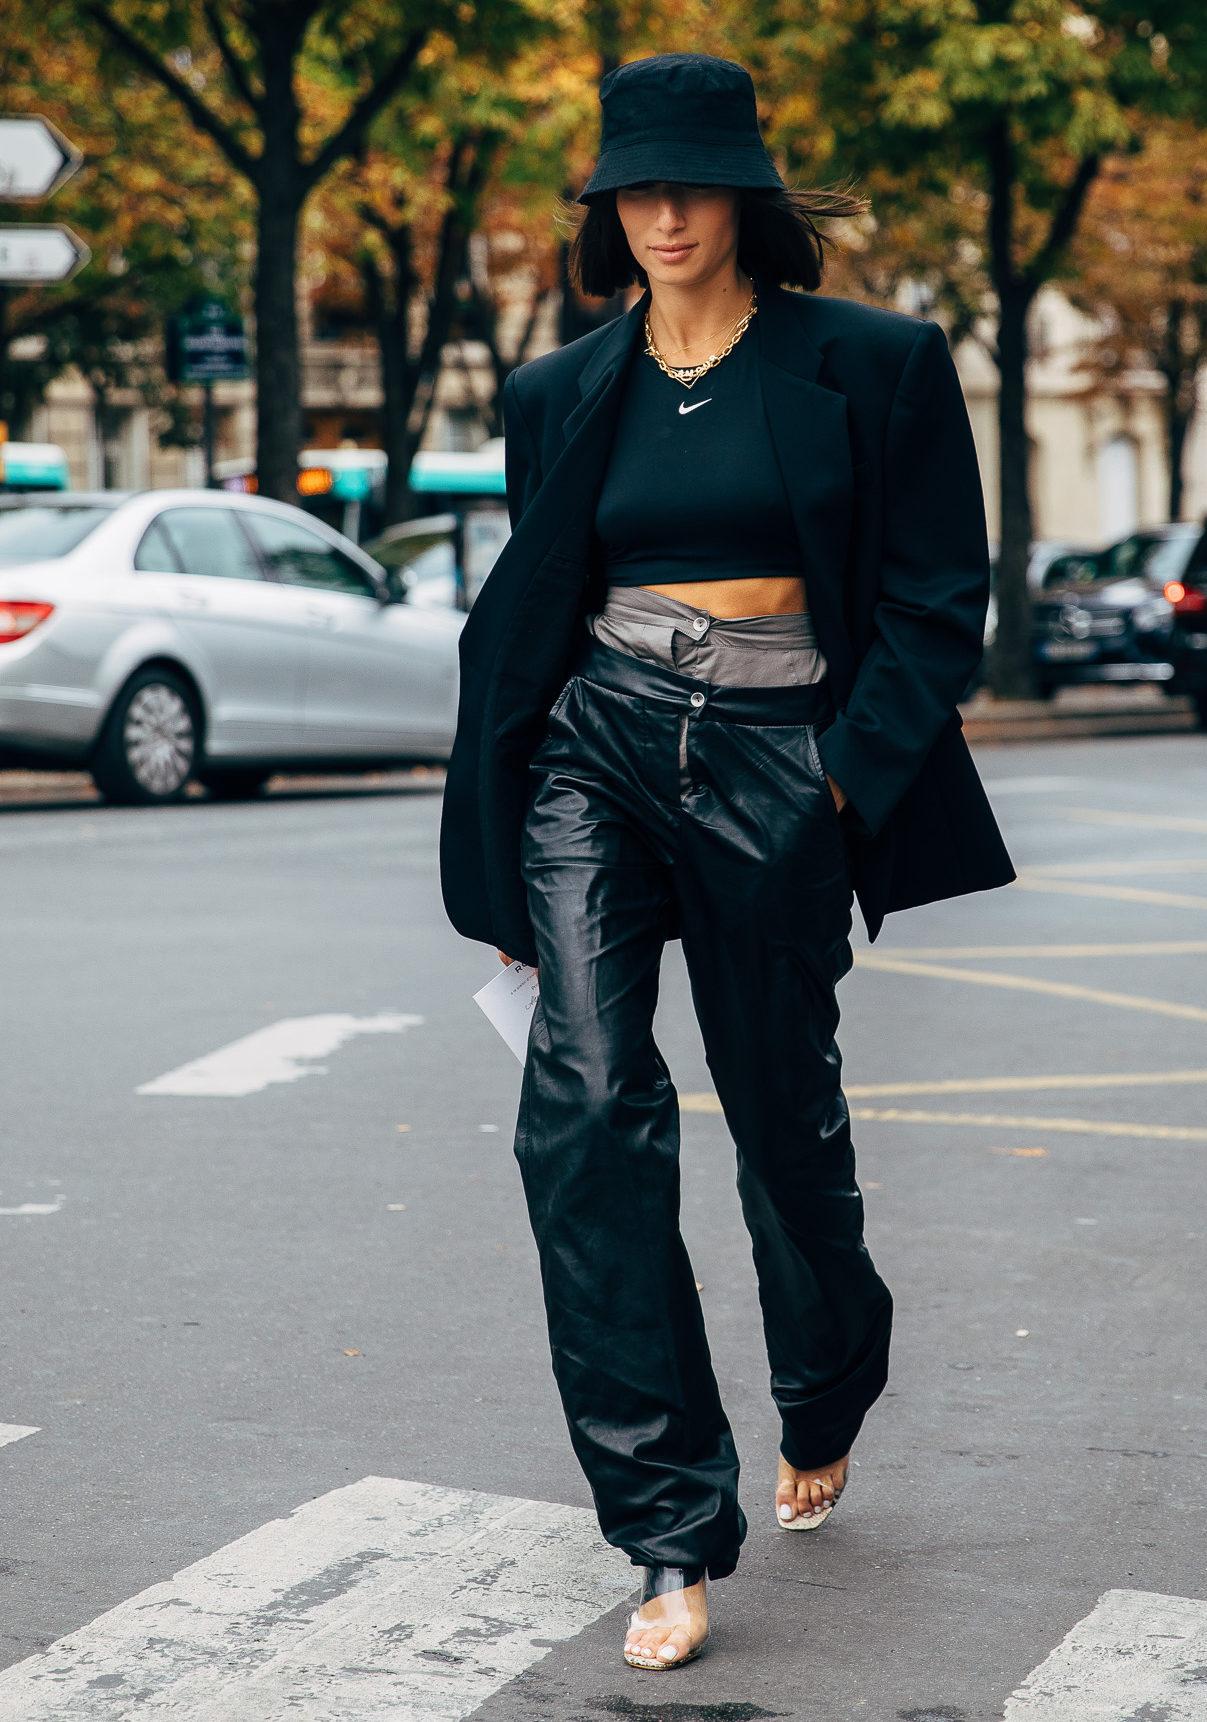 Alexandra-Guerain-by-STYLEDUMONDE-Street-Style-Fashion-Photography20190925_48A4327